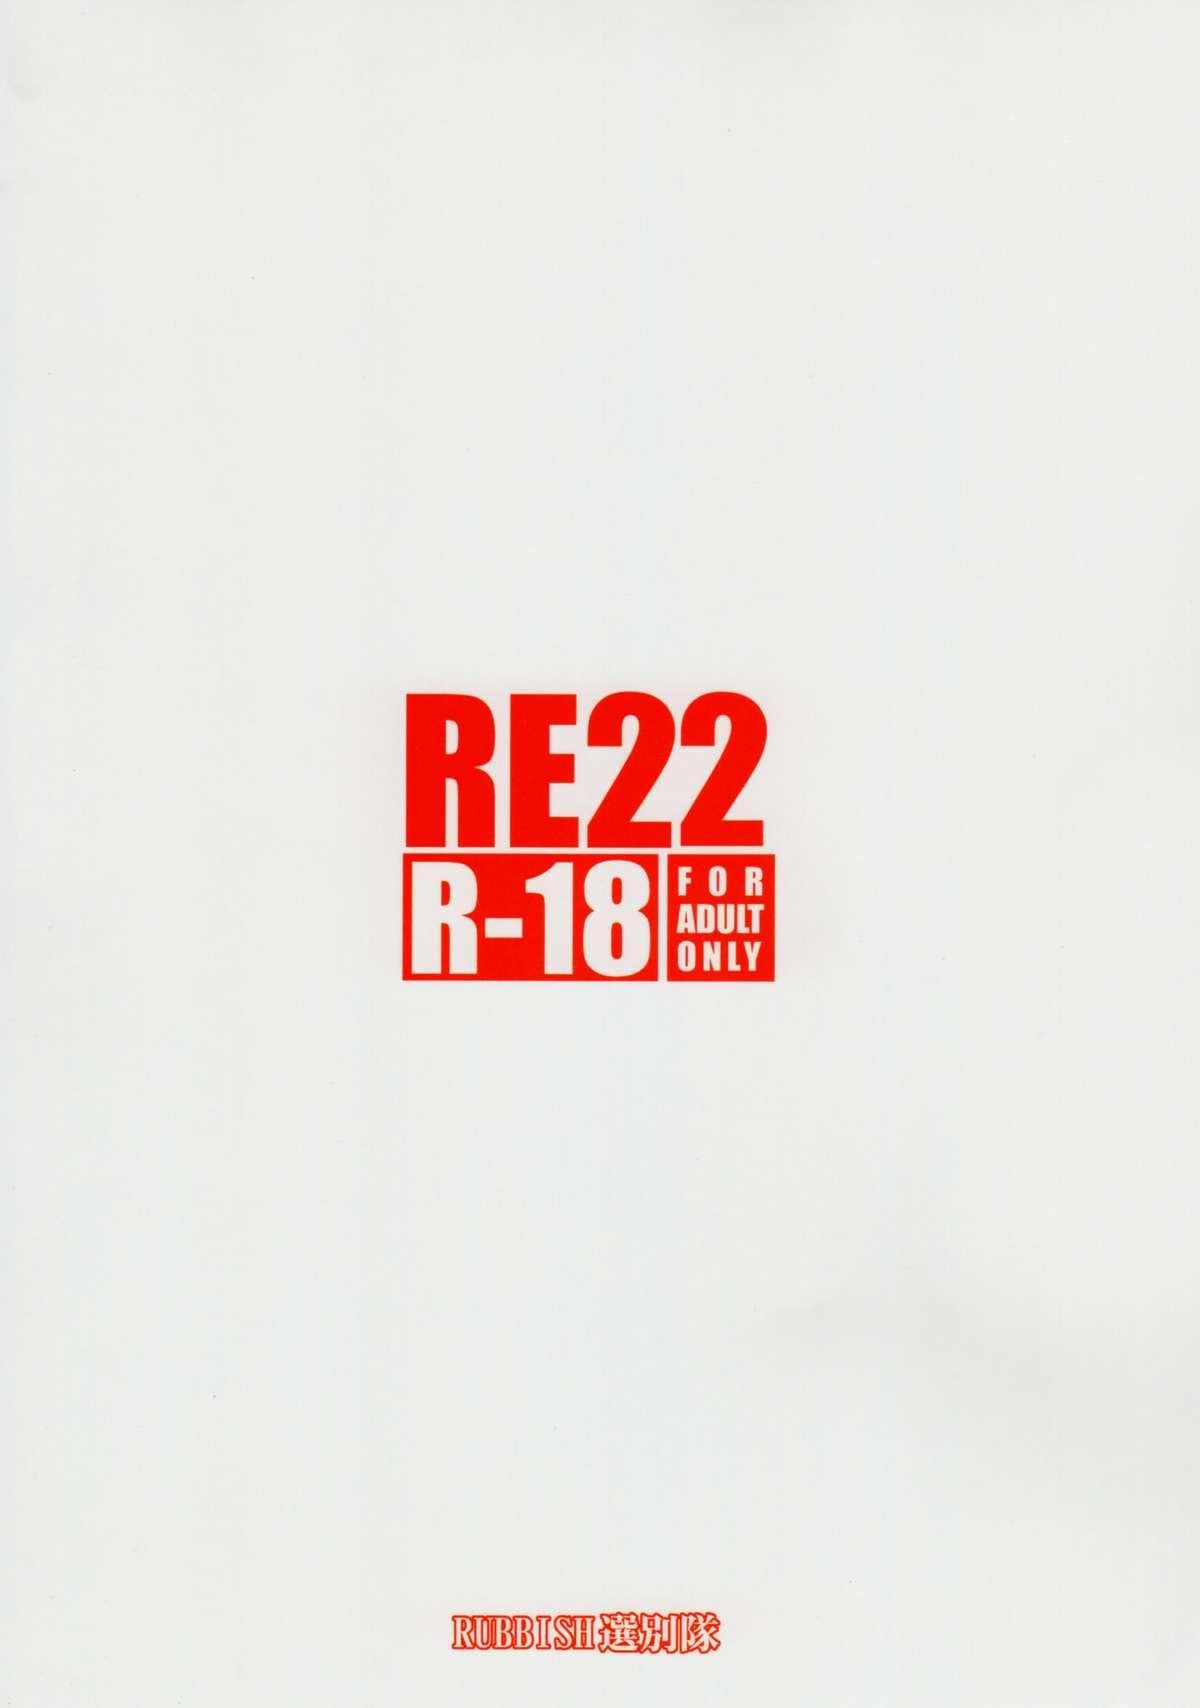 RE 22 41